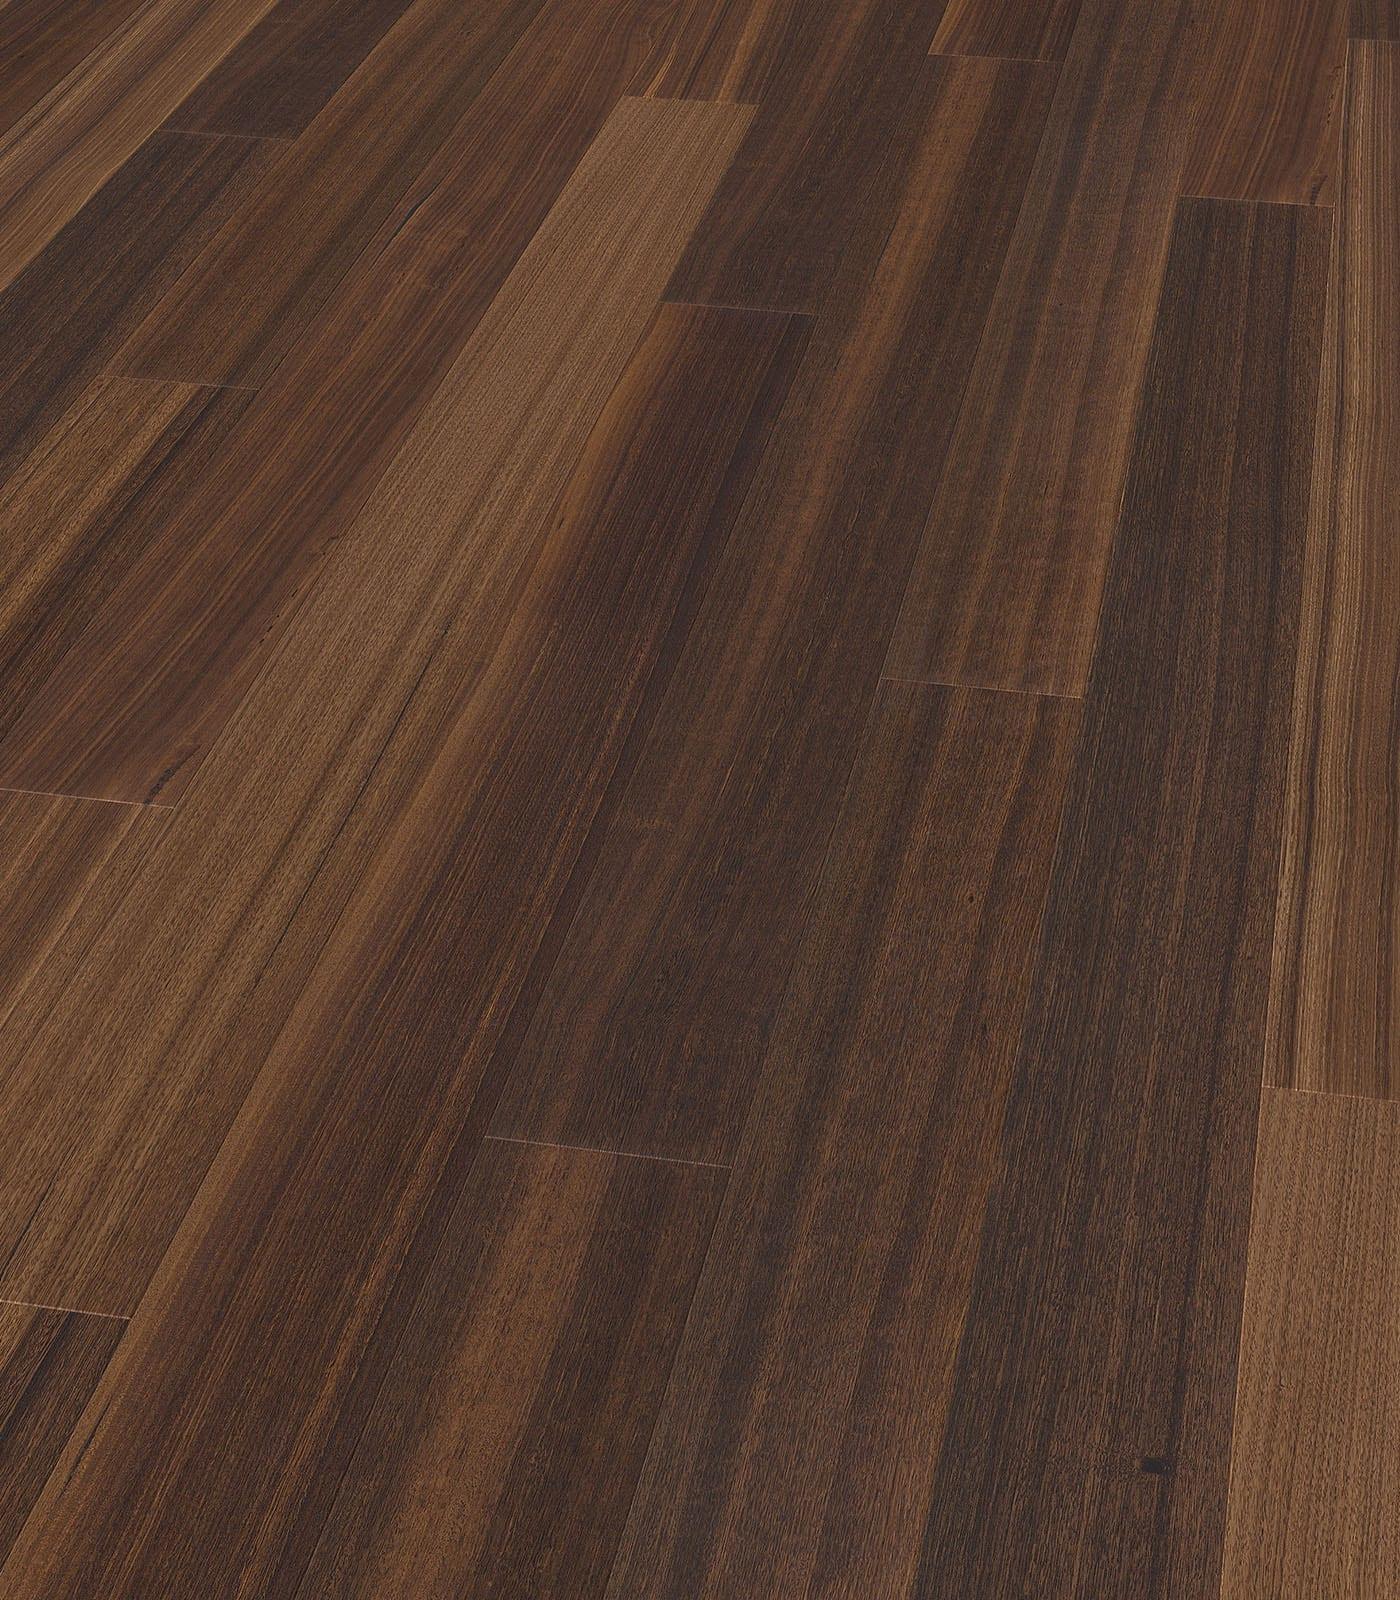 Uluru-After Oak Collection-Tasmanian Oak floors-angle